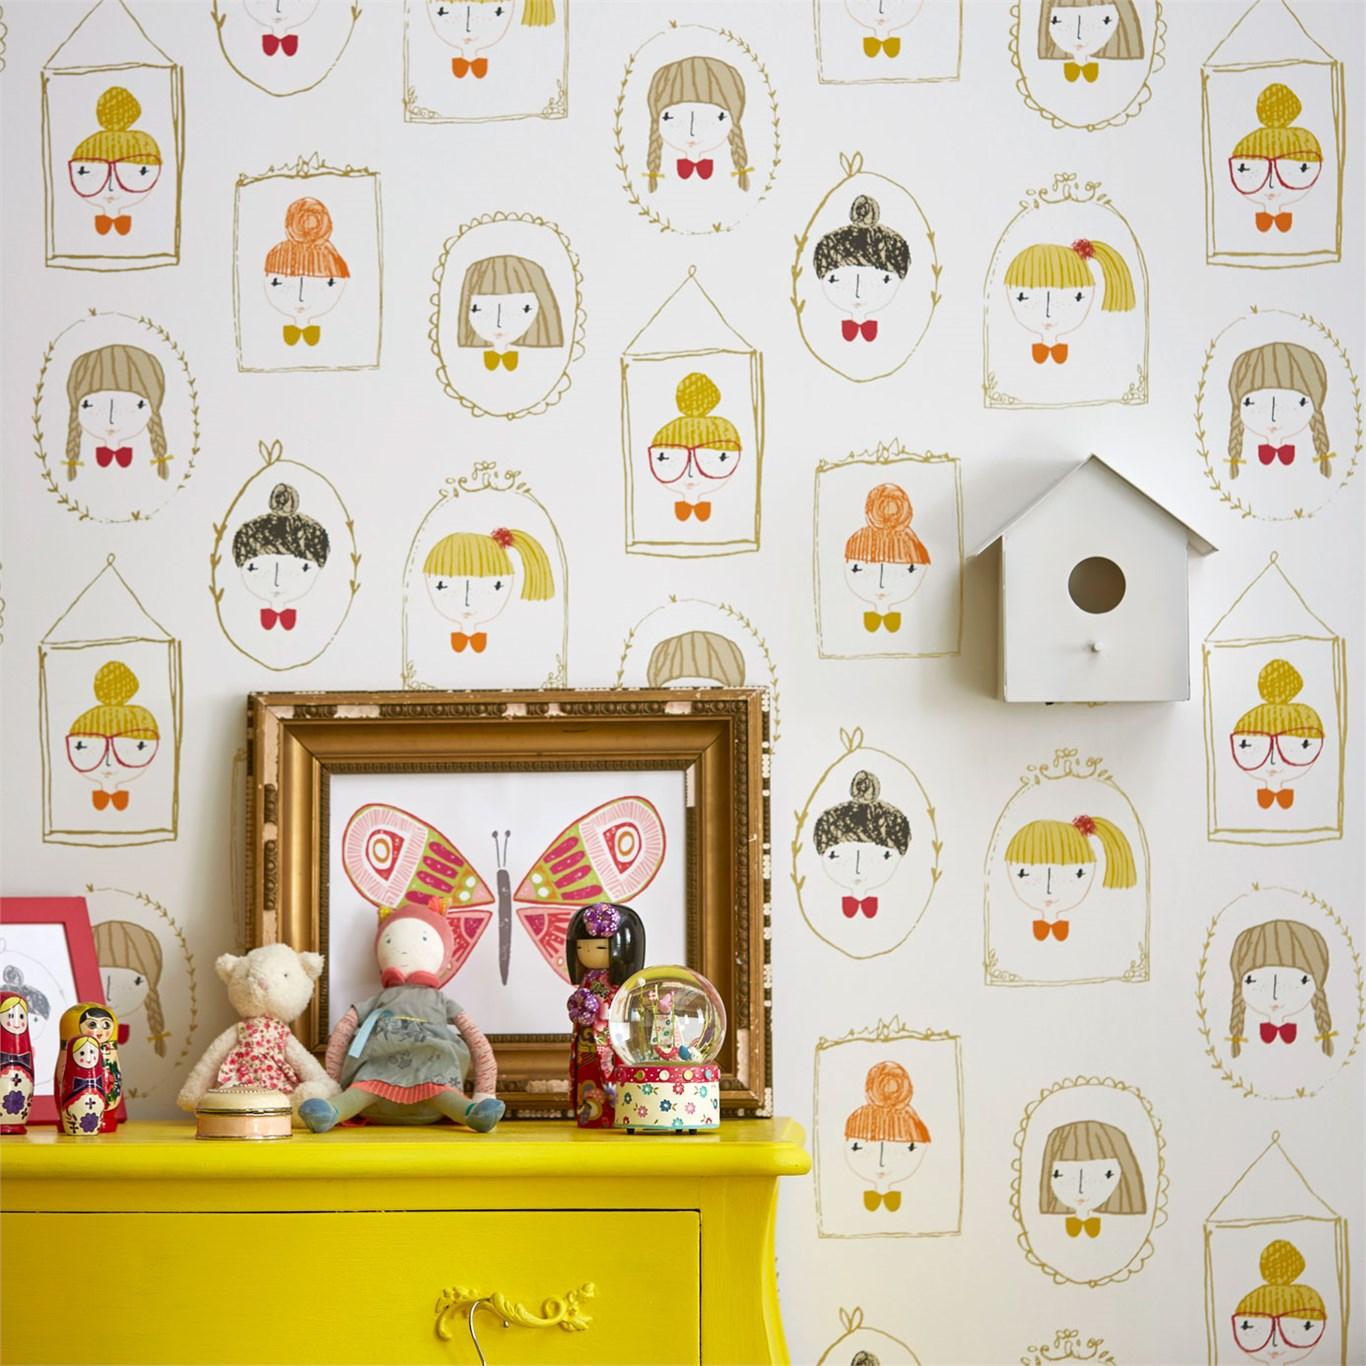 Scion-Guess-who-Hello-Dolly-wallpaper.jpg